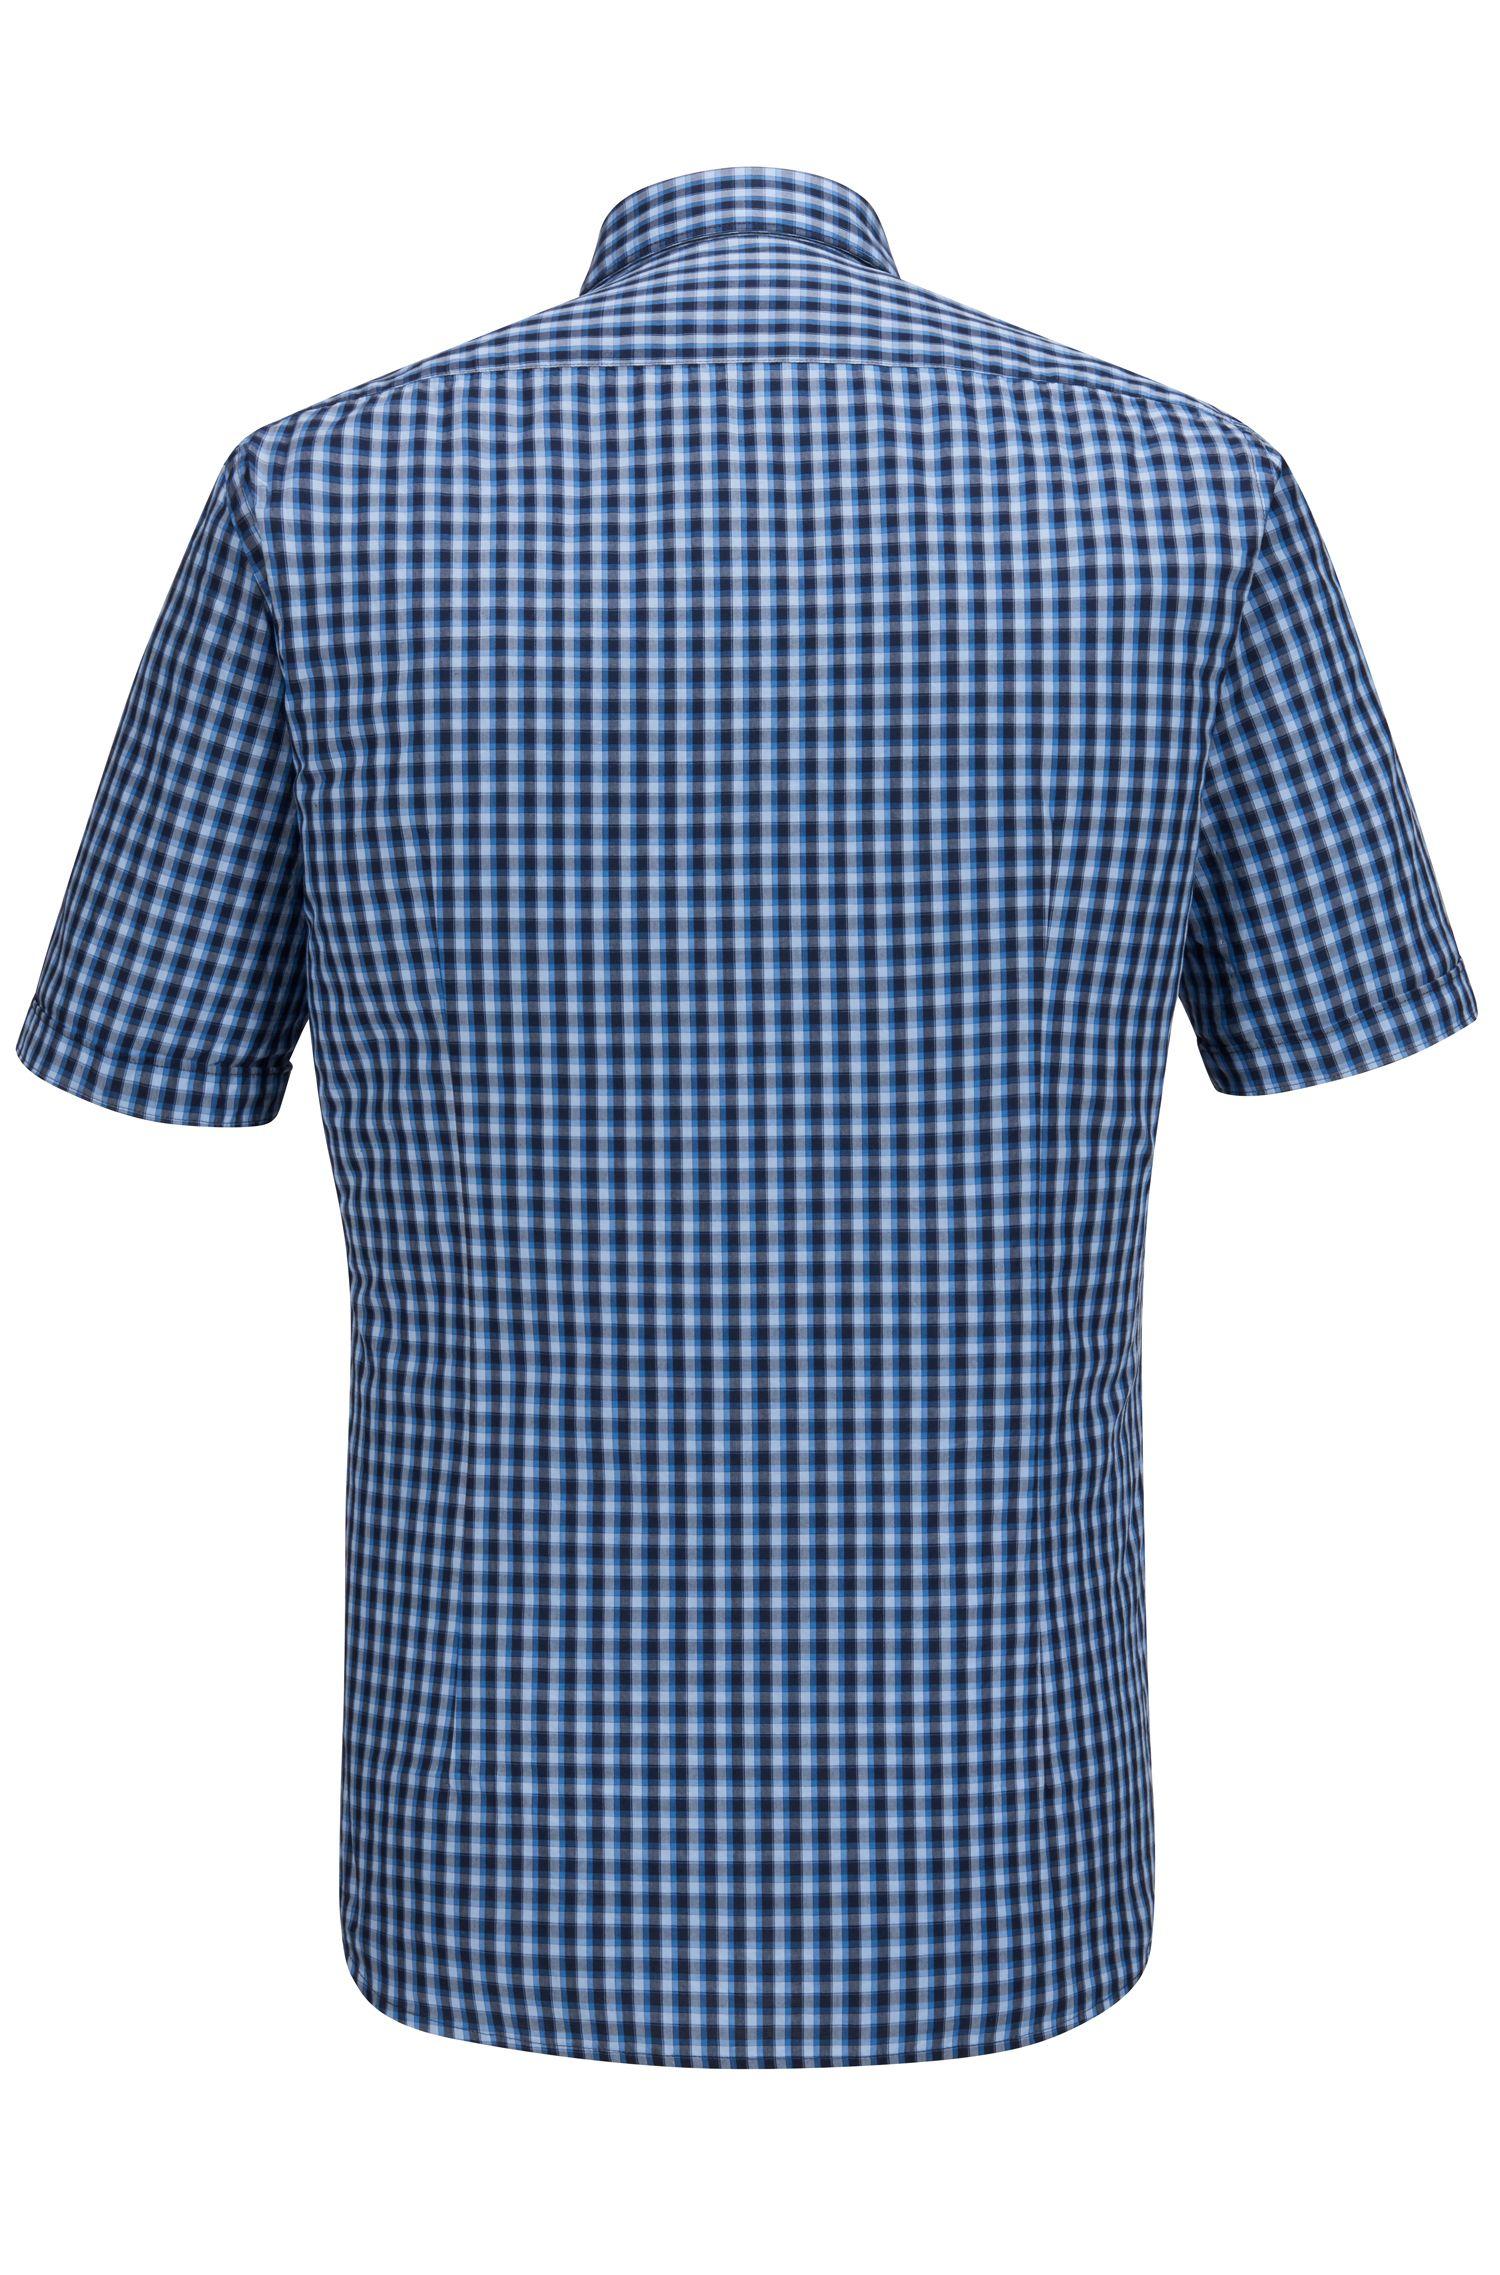 Check Cotton Button Down Shirt, Regular Fit   Luka